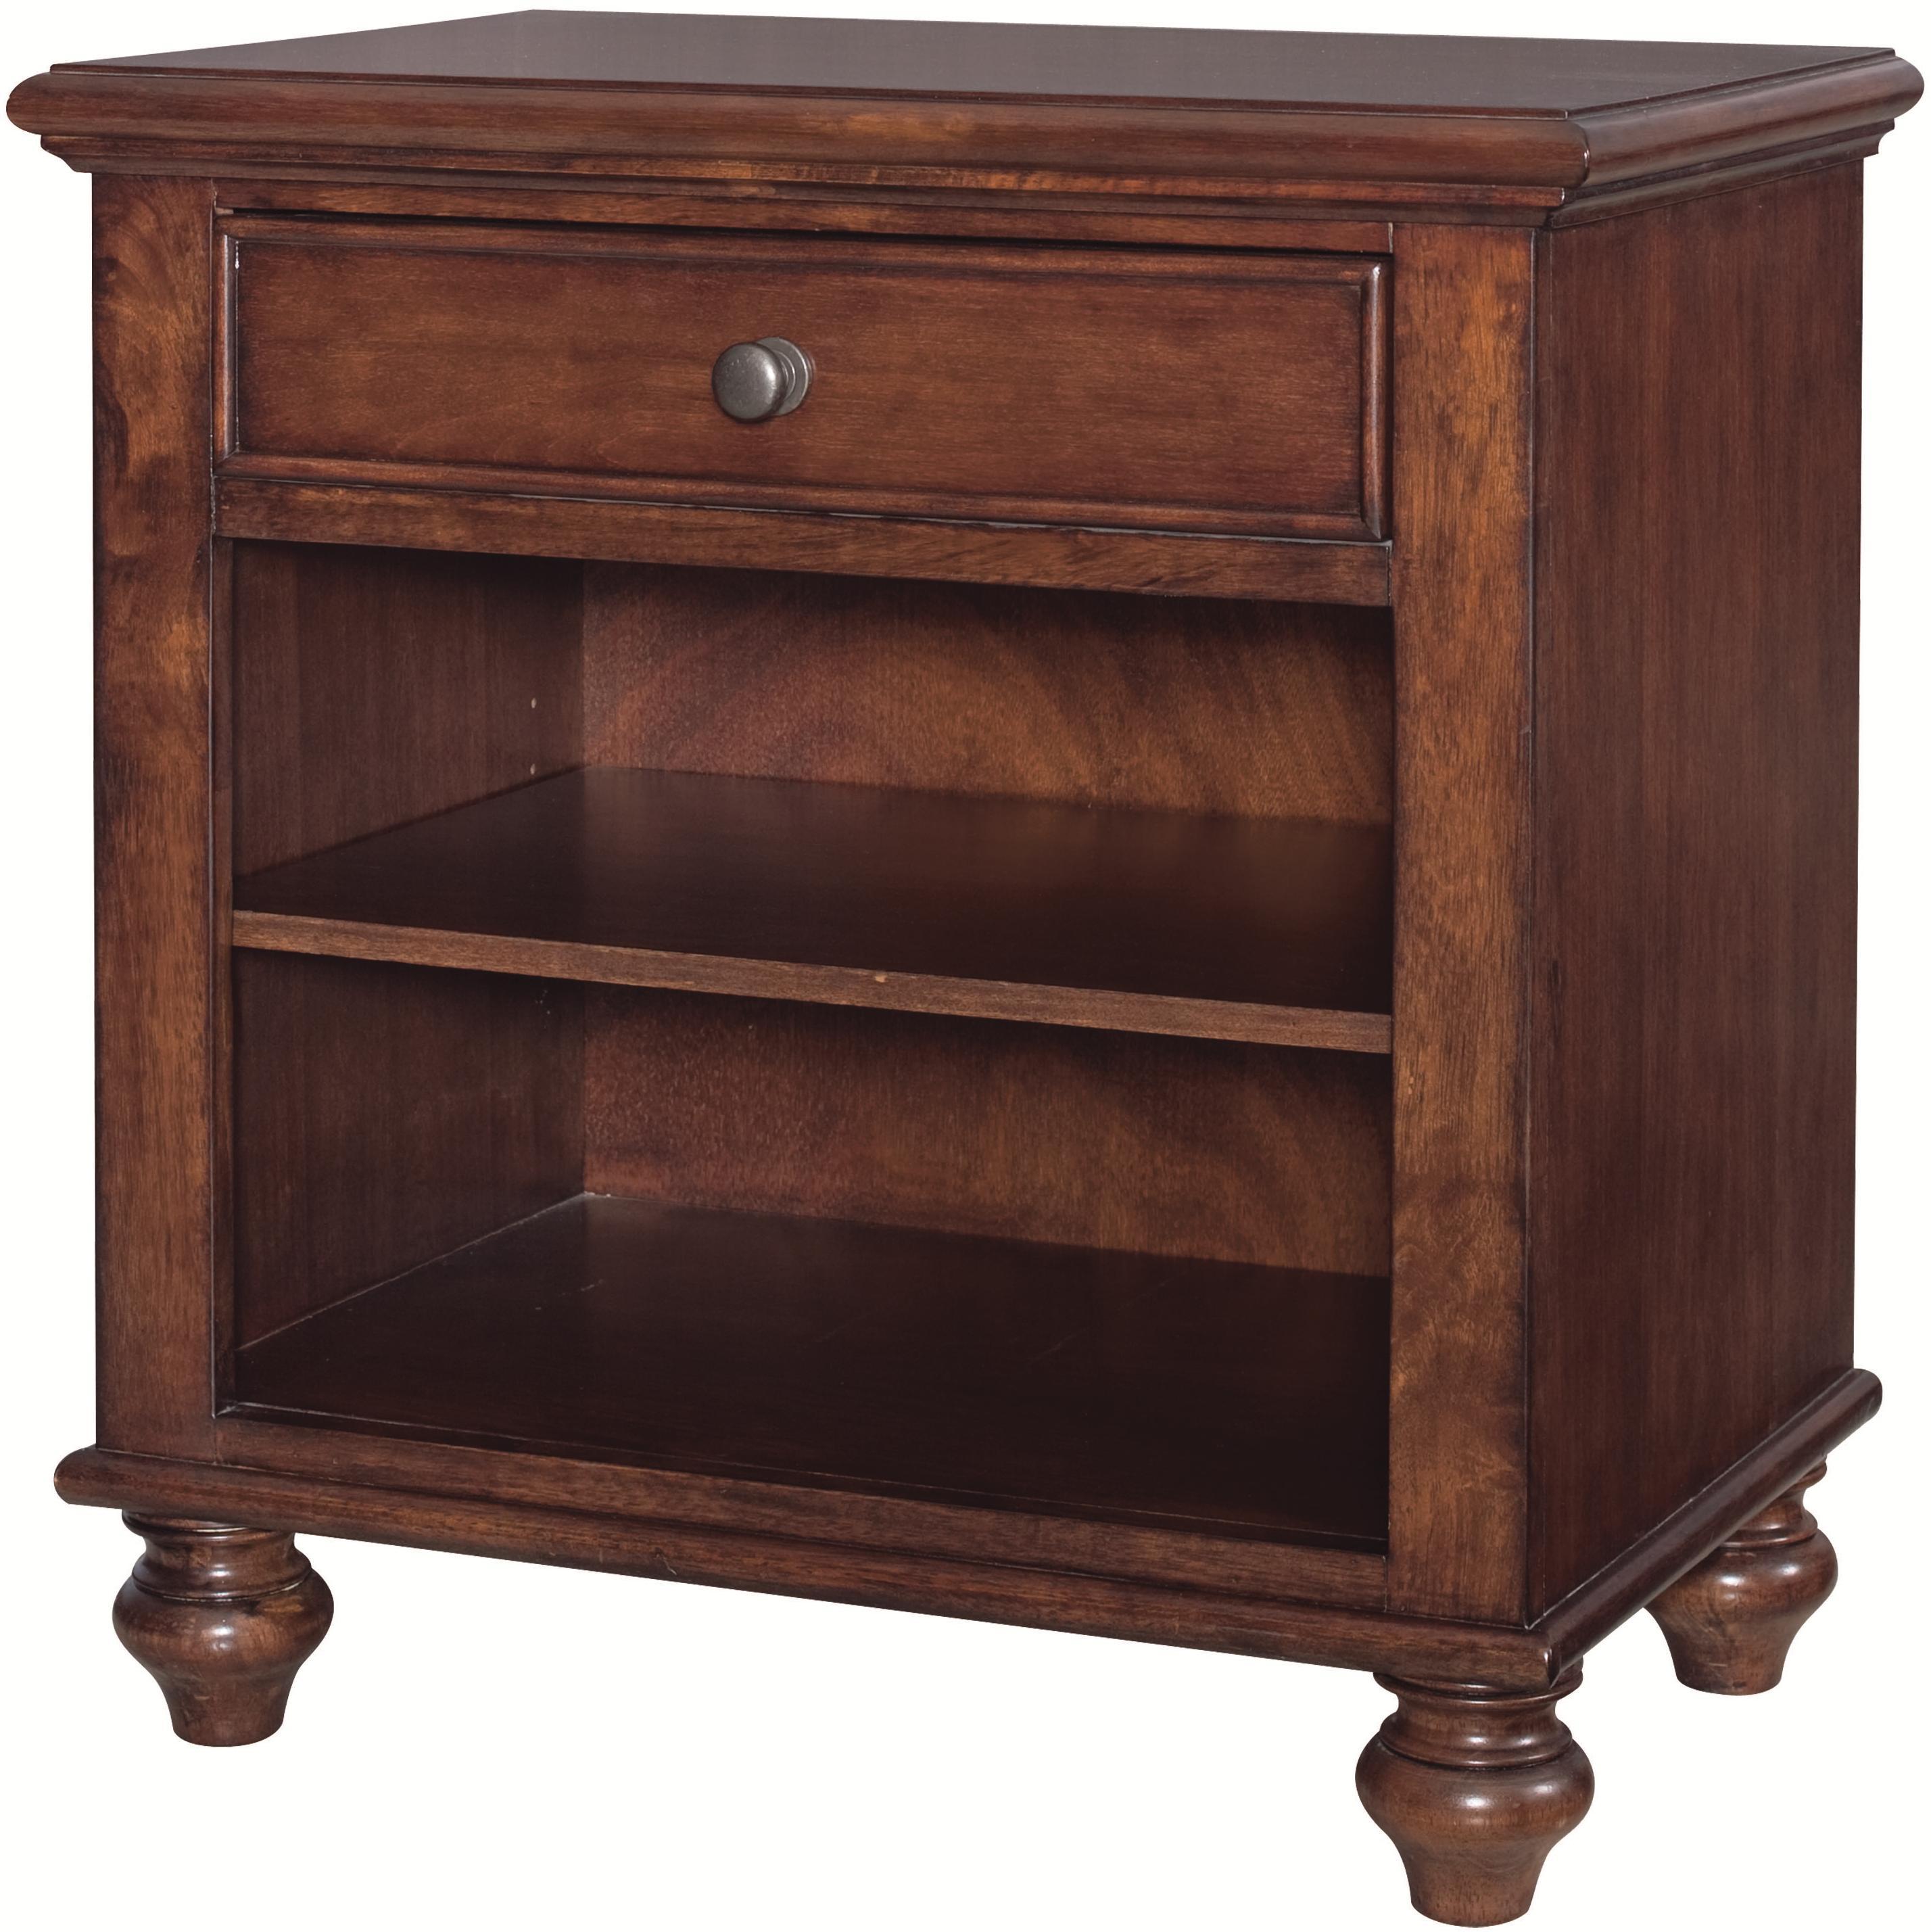 aspenhome madison ia200 451 brh one drawer one shelf. Black Bedroom Furniture Sets. Home Design Ideas